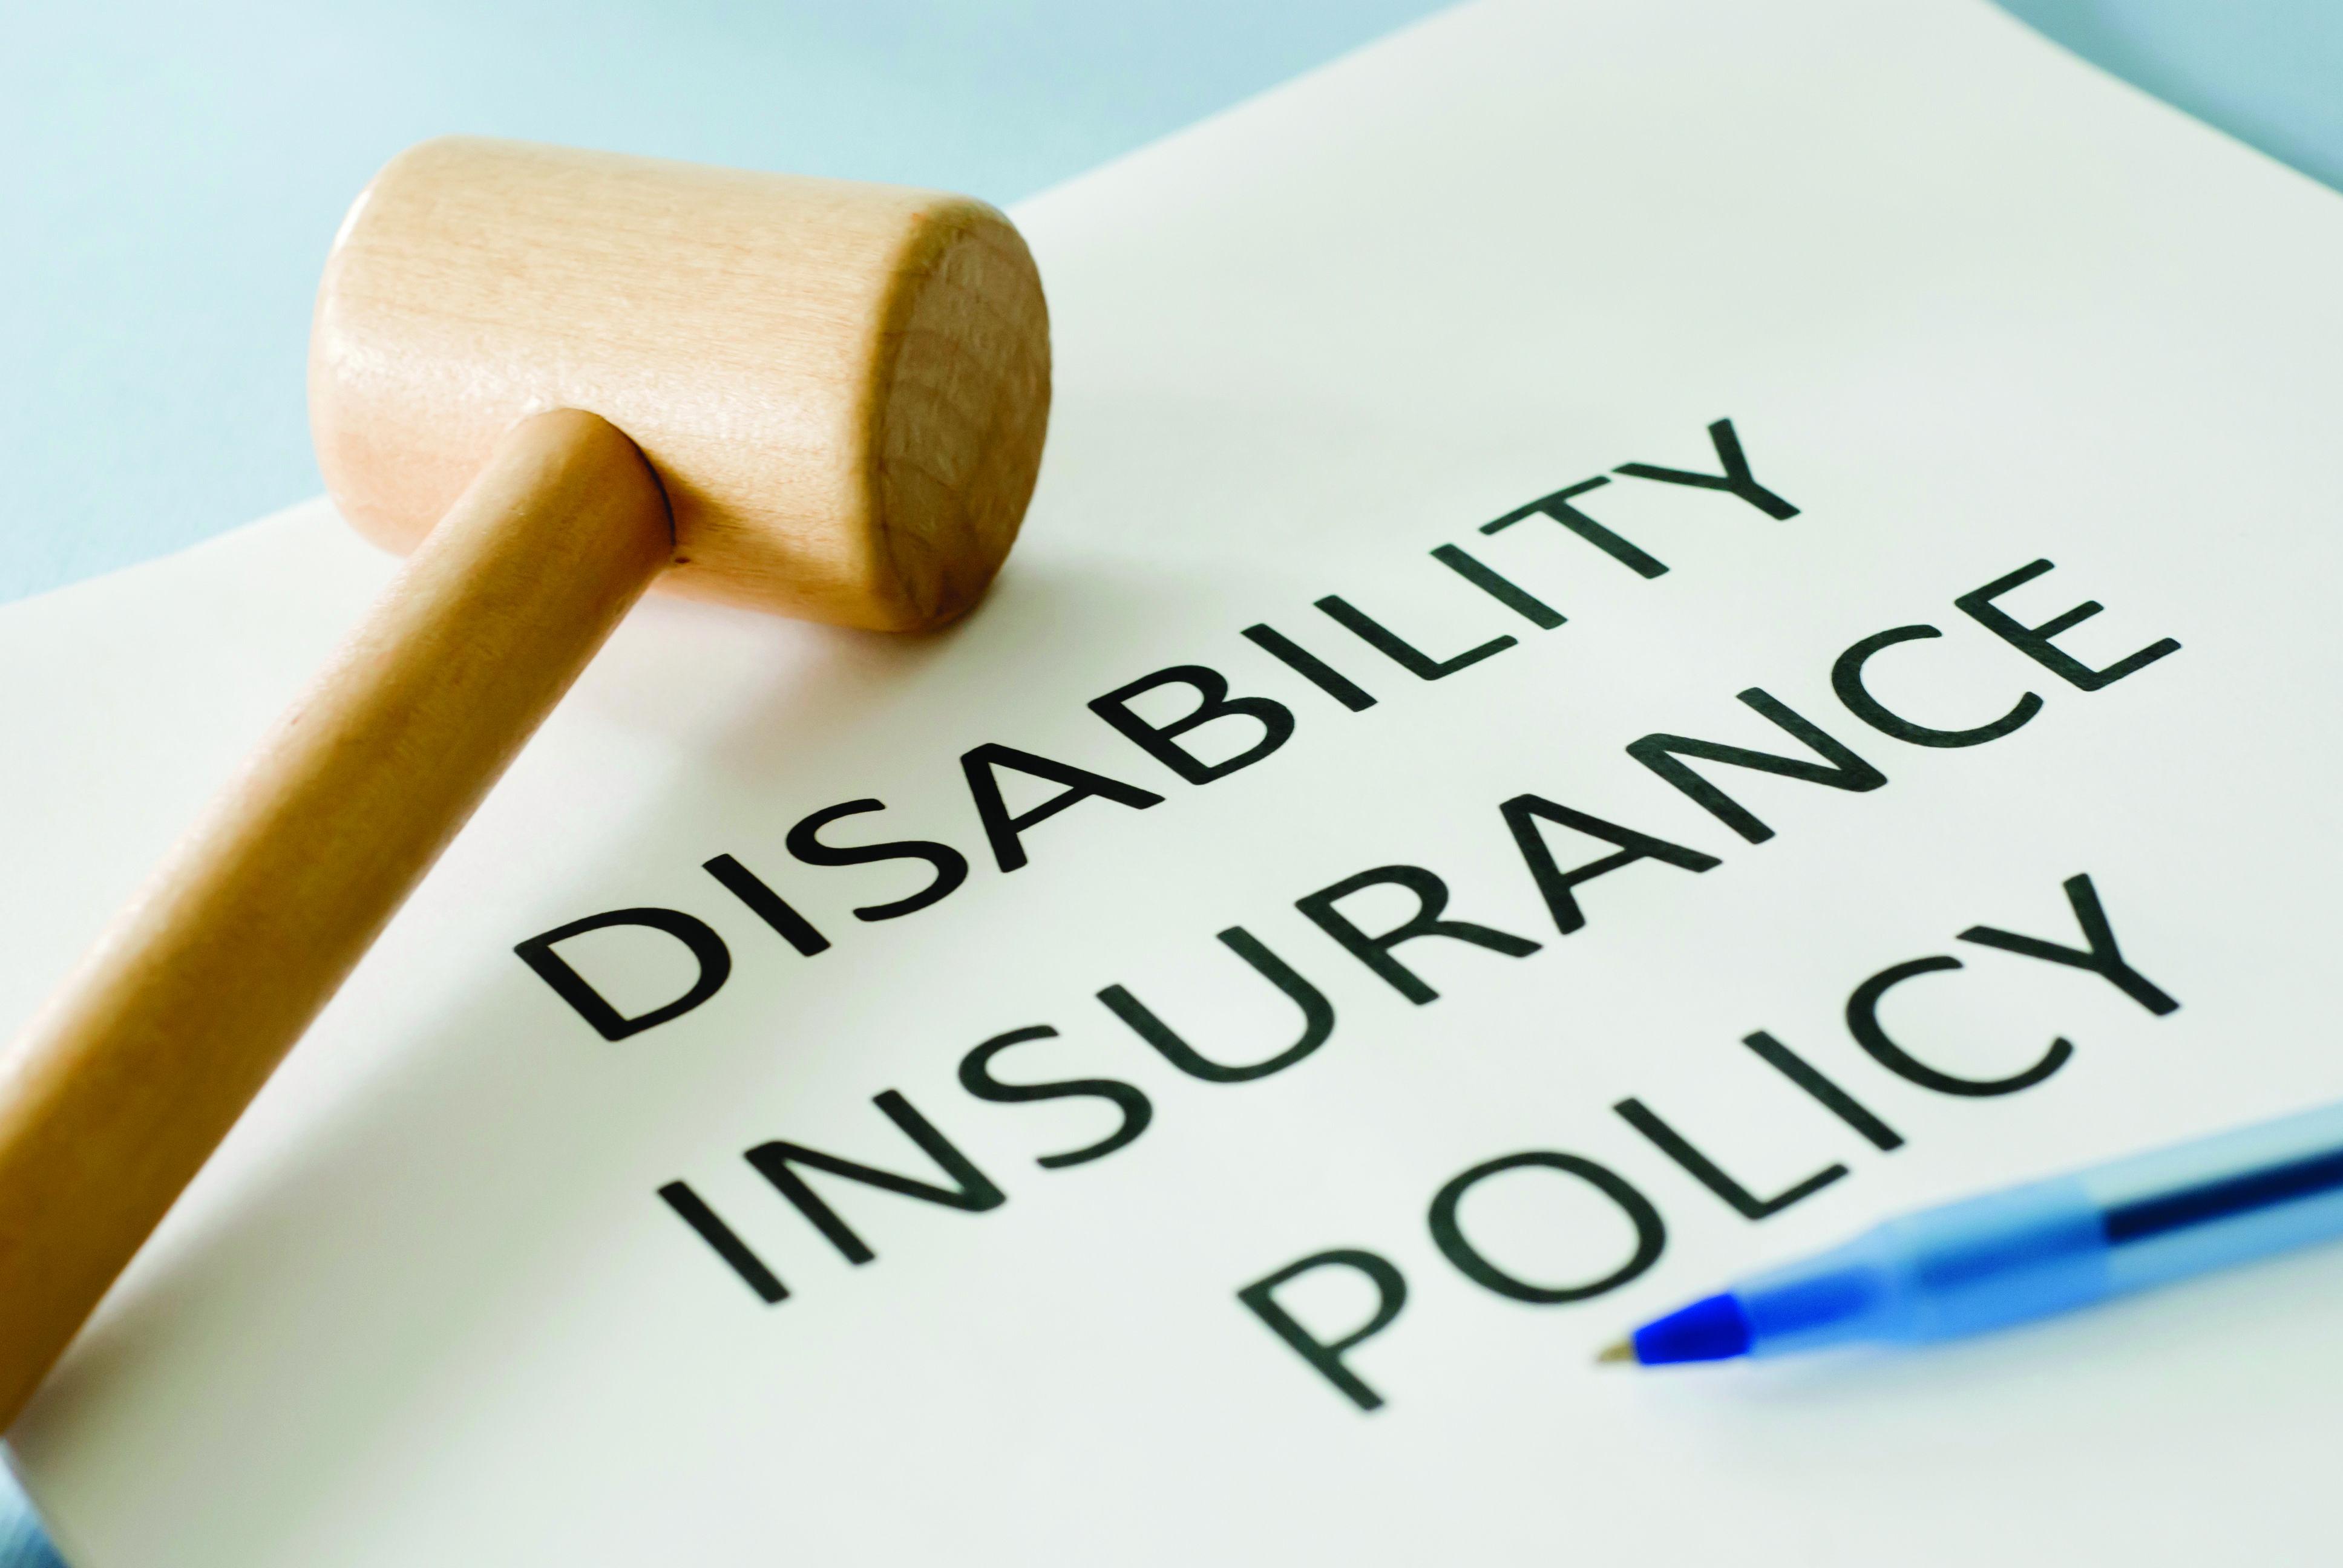 dental disability insurance definition